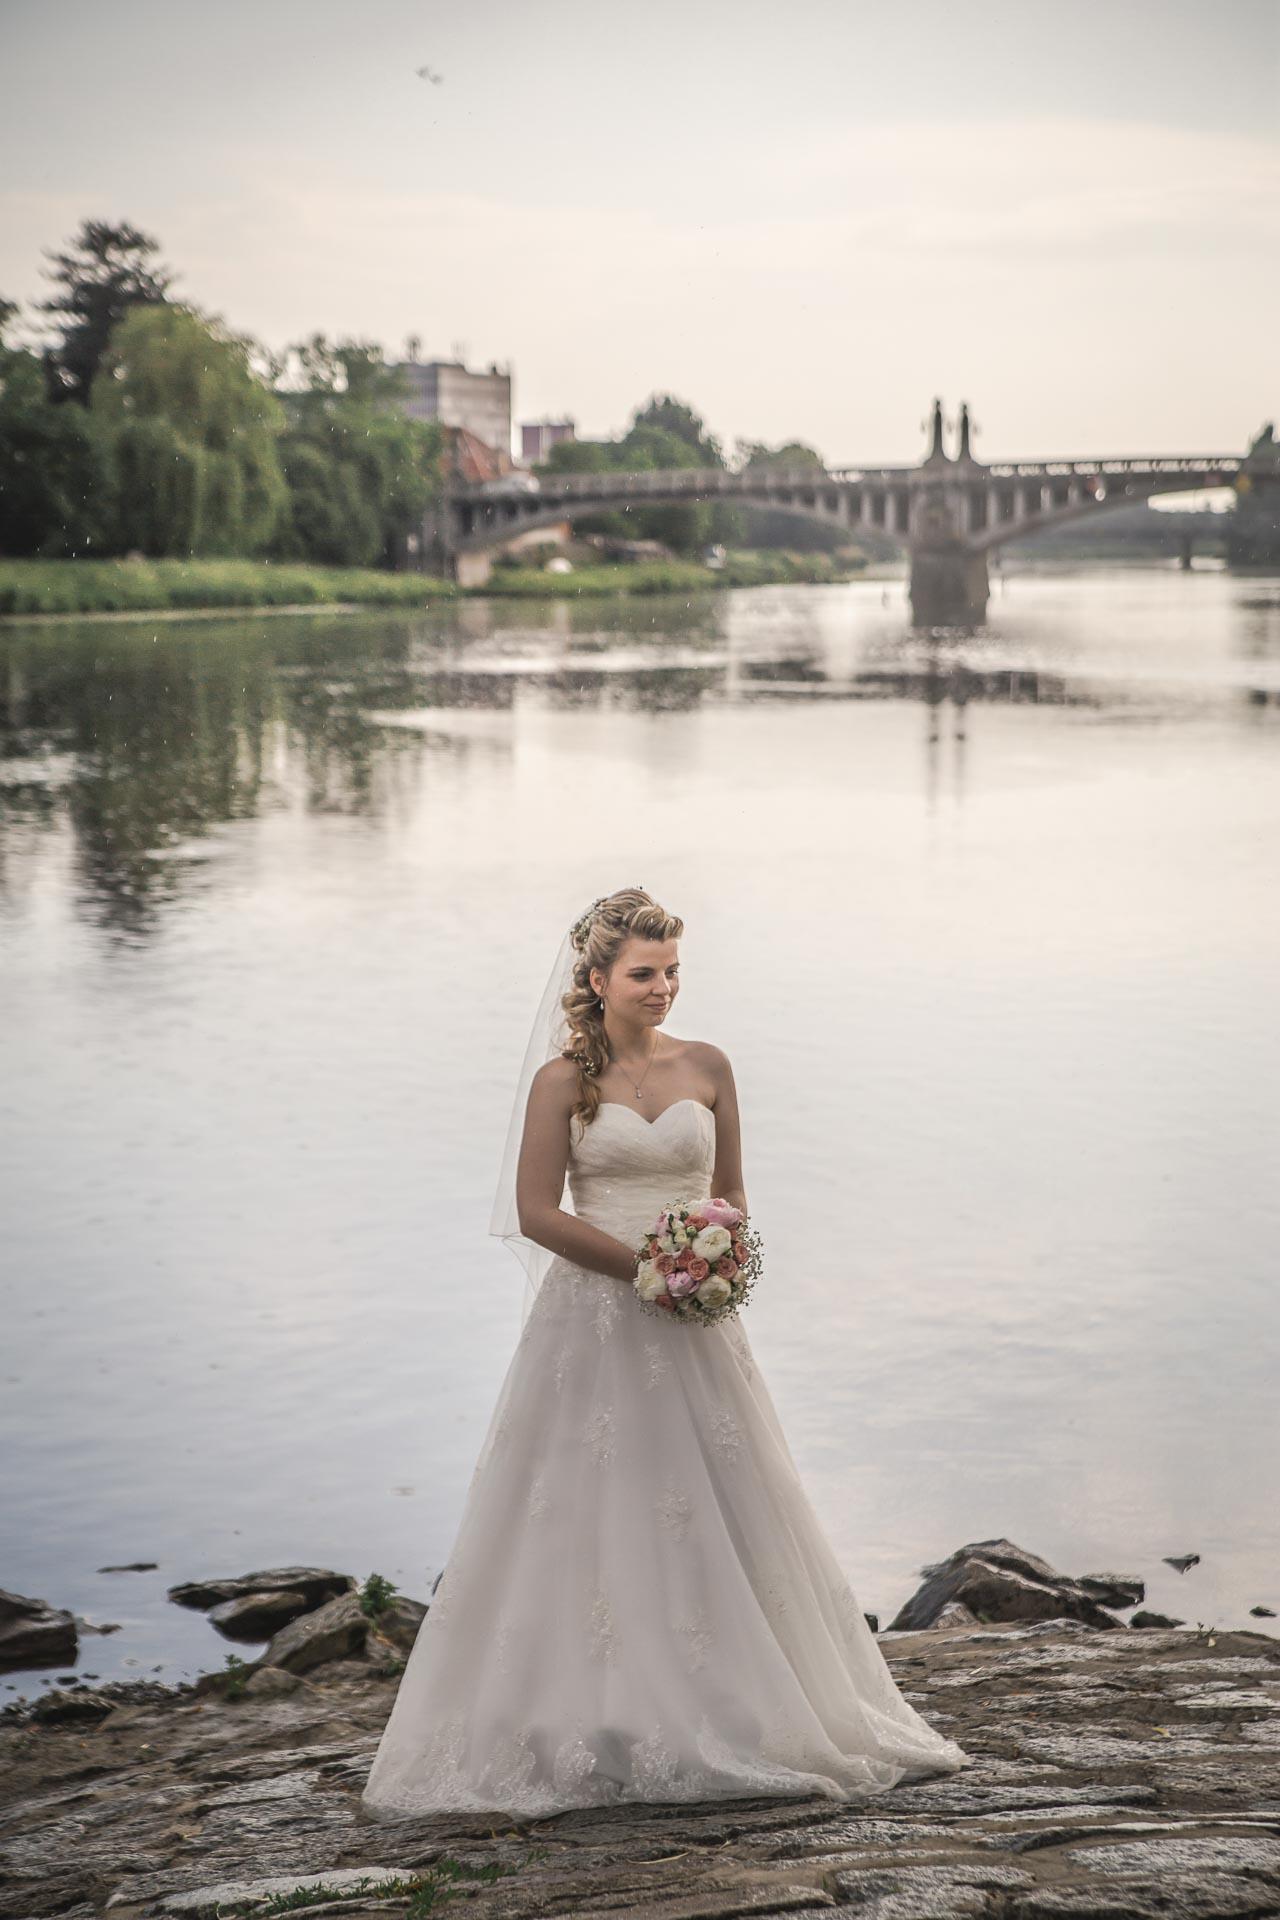 Svatební-fotograf-Nymburk-6245